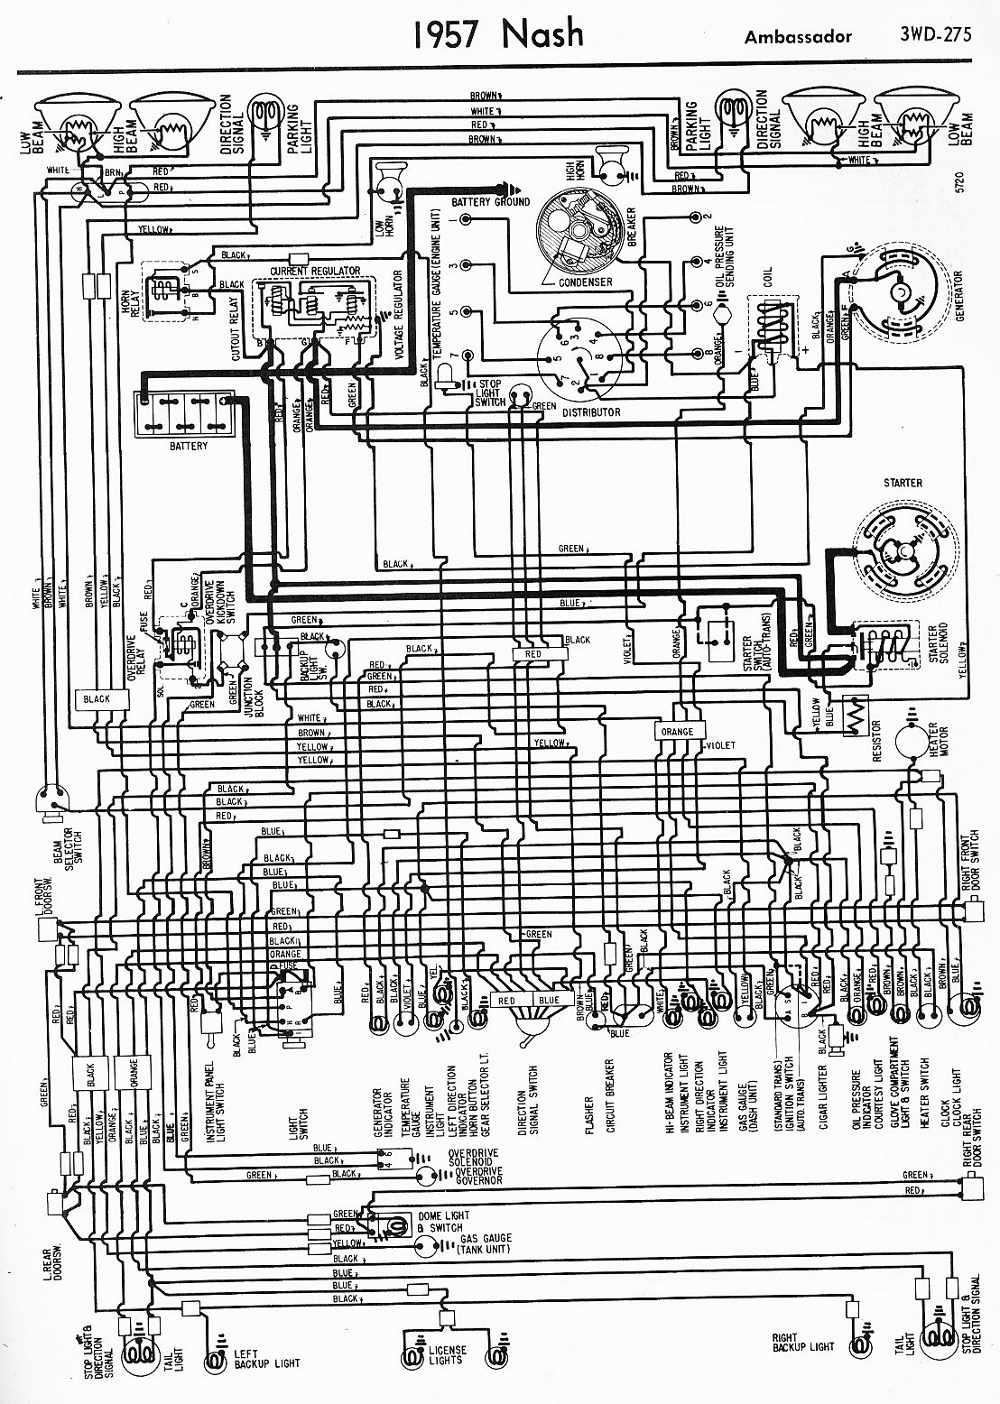 Wiring Packard For Diagram Tqs81 | Wiring Diagram on audi wiring diagram, volvo wiring diagram, velie wiring diagram, henry j wiring diagram, dodge wiring diagram, am general wiring diagram, chrysler new yorker wiring diagram, international wiring diagram, bentley wiring diagram, oldsmobile 88 wiring diagram, western star wiring diagram, saturn wiring diagram, mercury wiring diagram, sterling wiring diagram, nissan wiring diagram, winnebago wiring diagram, austin healey wiring diagram, essex wiring diagram, jensen wiring diagram, oldsmobile cutlass wiring diagram,